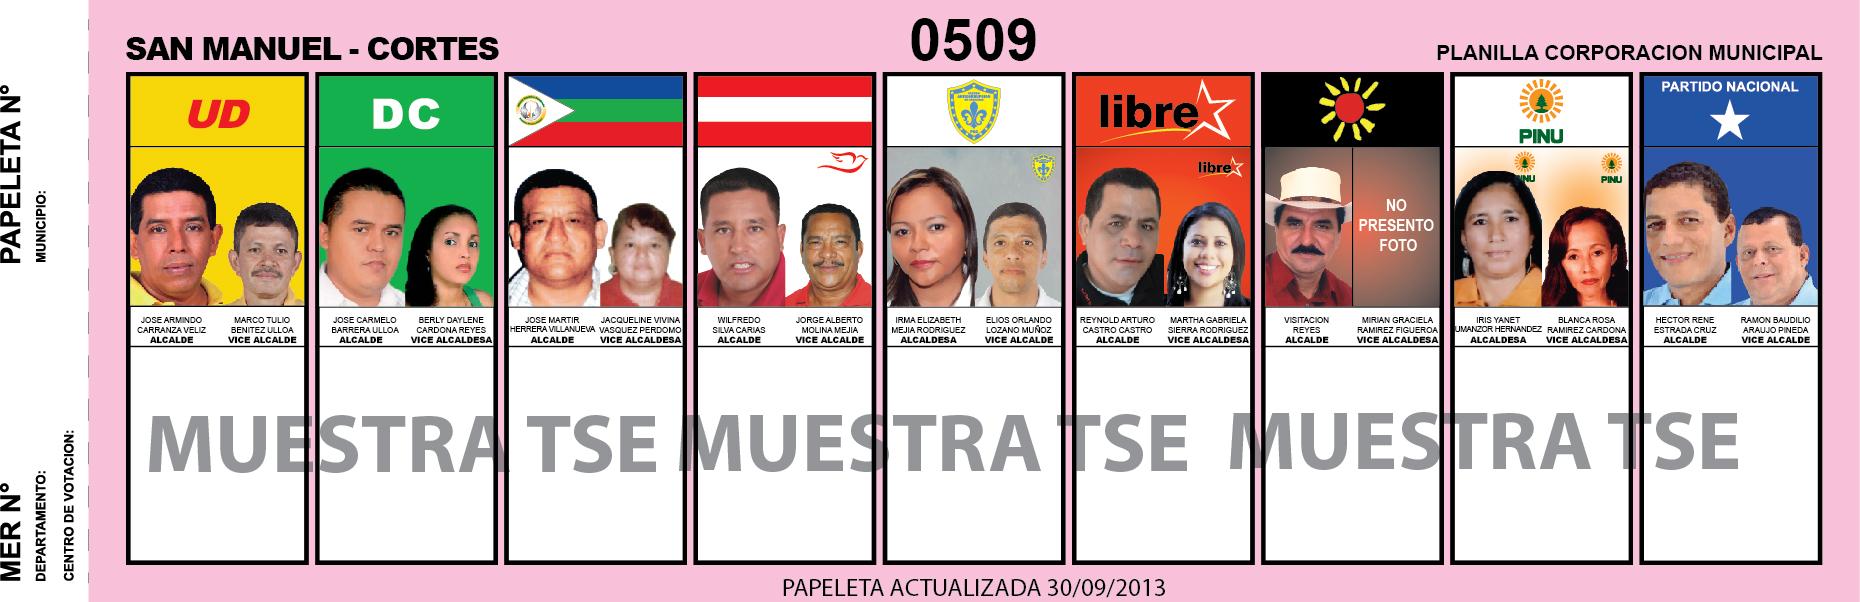 CANDIDATOS 2013 MUNICIPIO SAN MANUEL - CORTES - HONDURAS